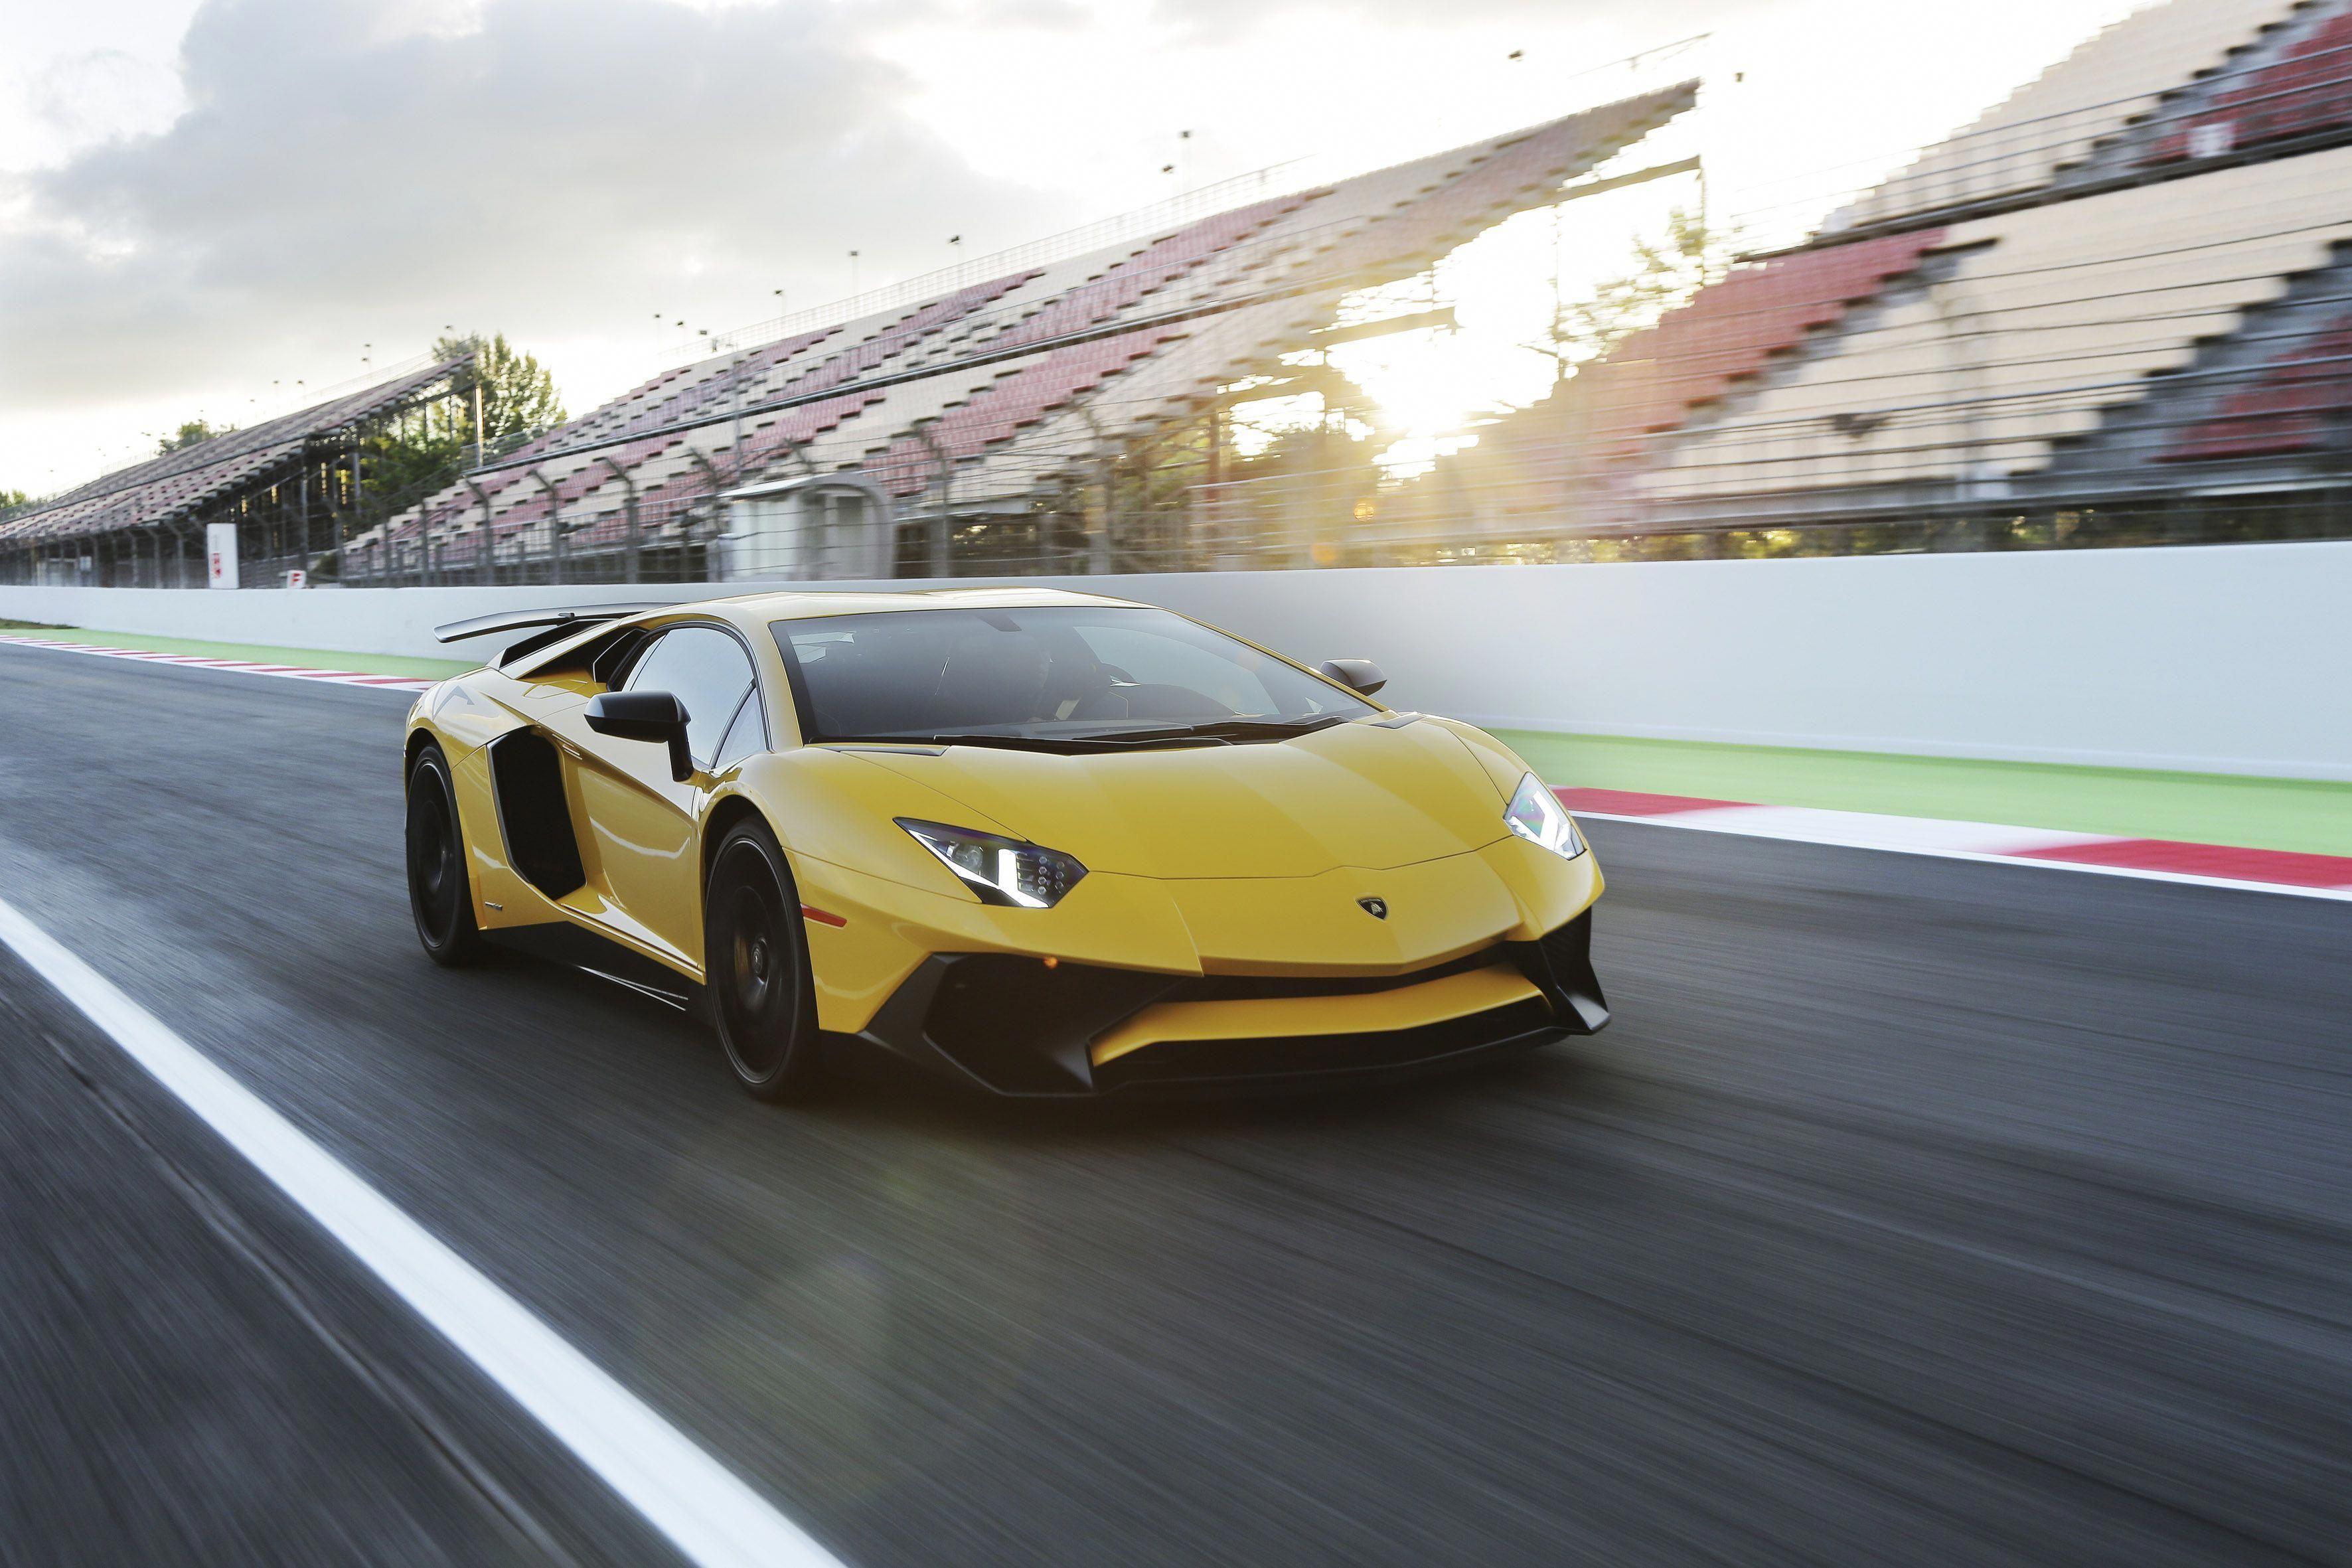 Lamborghini Mit Team Up To Fuel The Future Of Supercars Roadshow Thefast Theluxurious Lamborghini Aventador